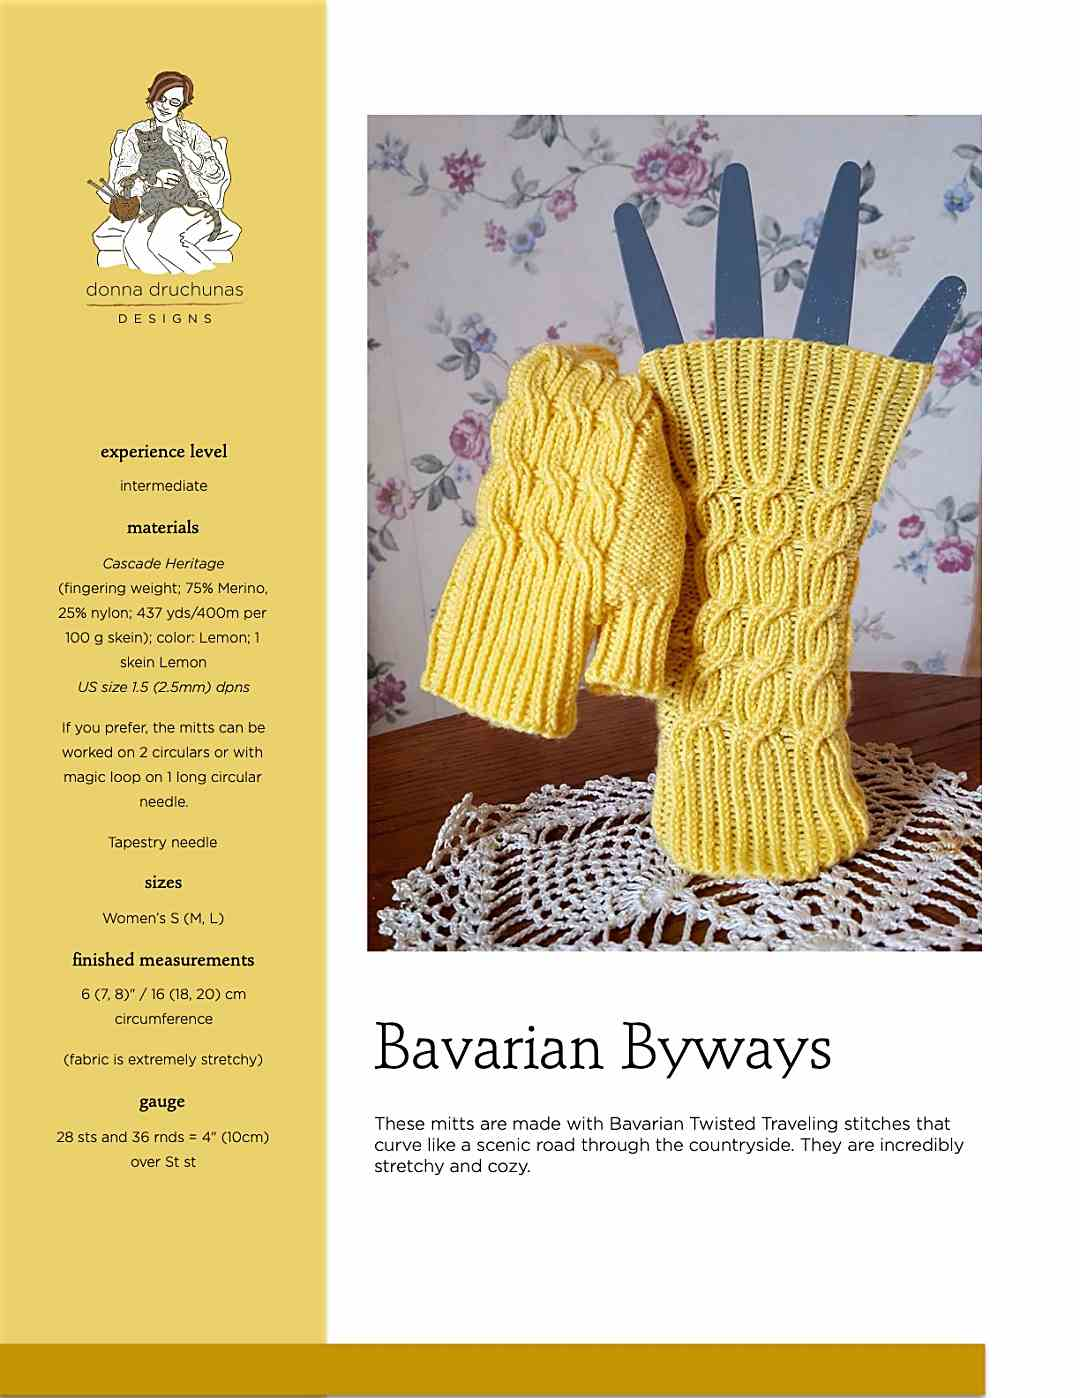 Bavarian Byways Mitts | Knitting Pattern 1